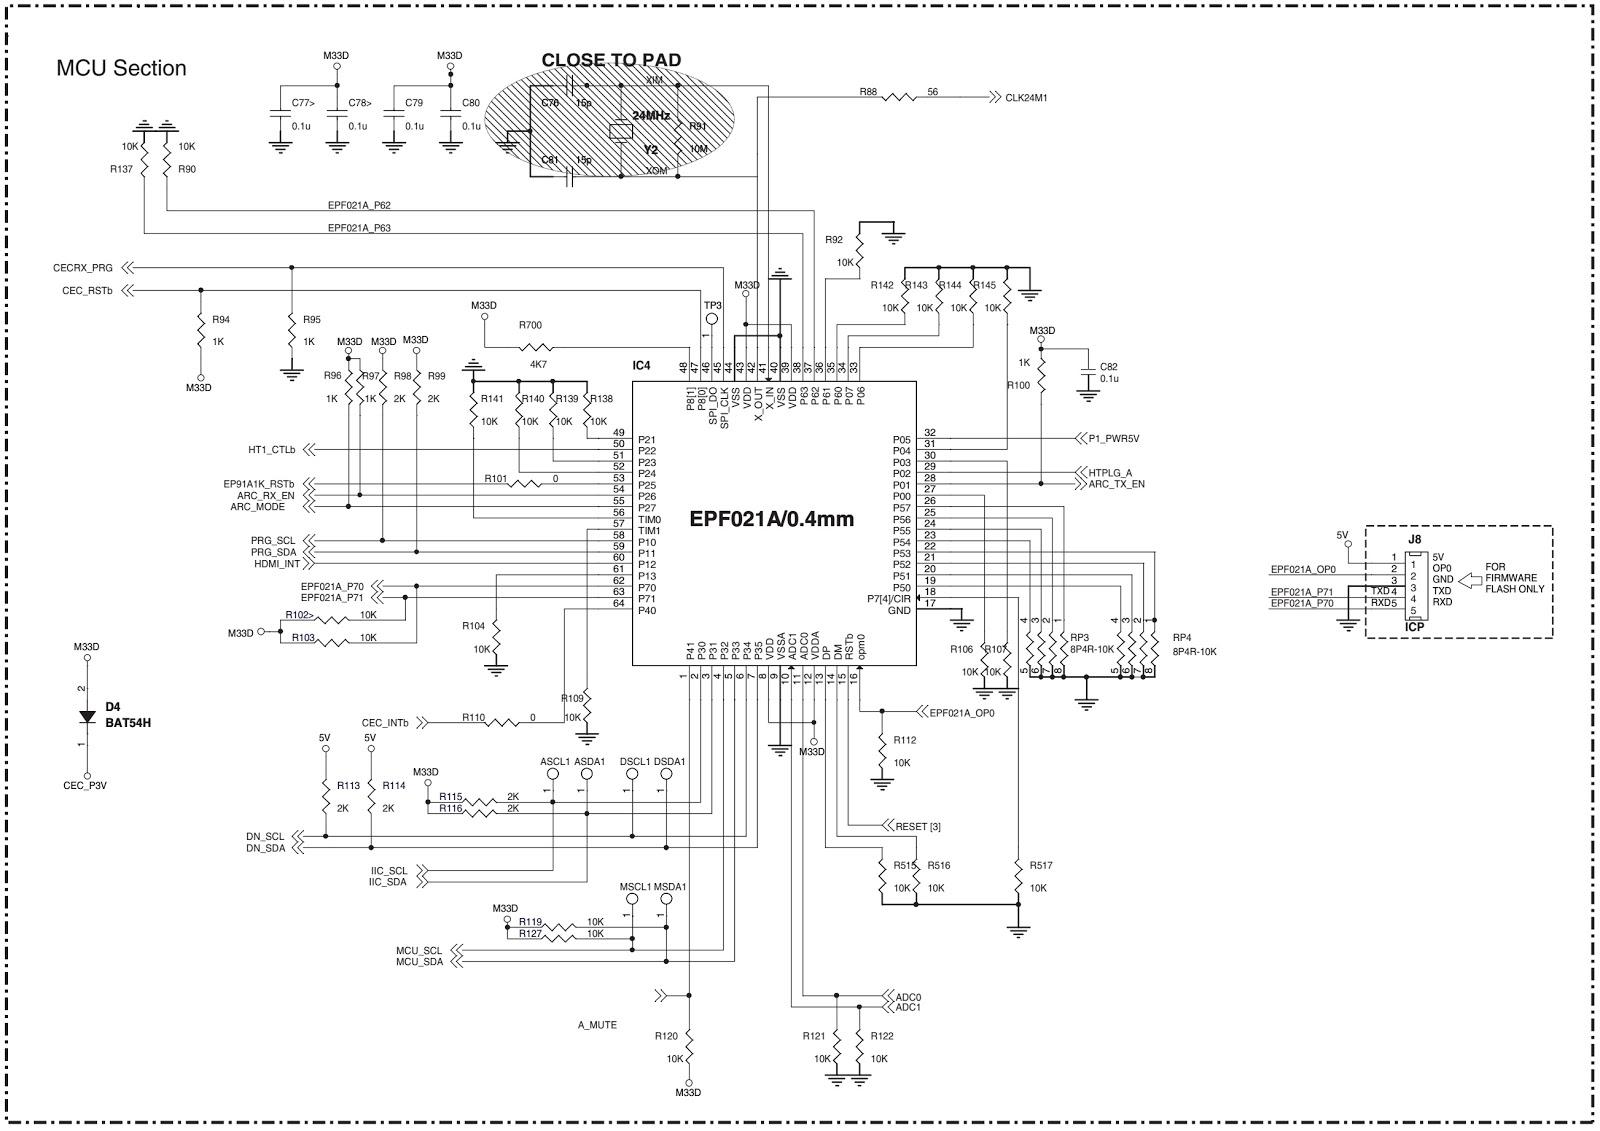 Sharp HTSL50 SOUND BAR HOME THEATER SYSTEM – Disassembly